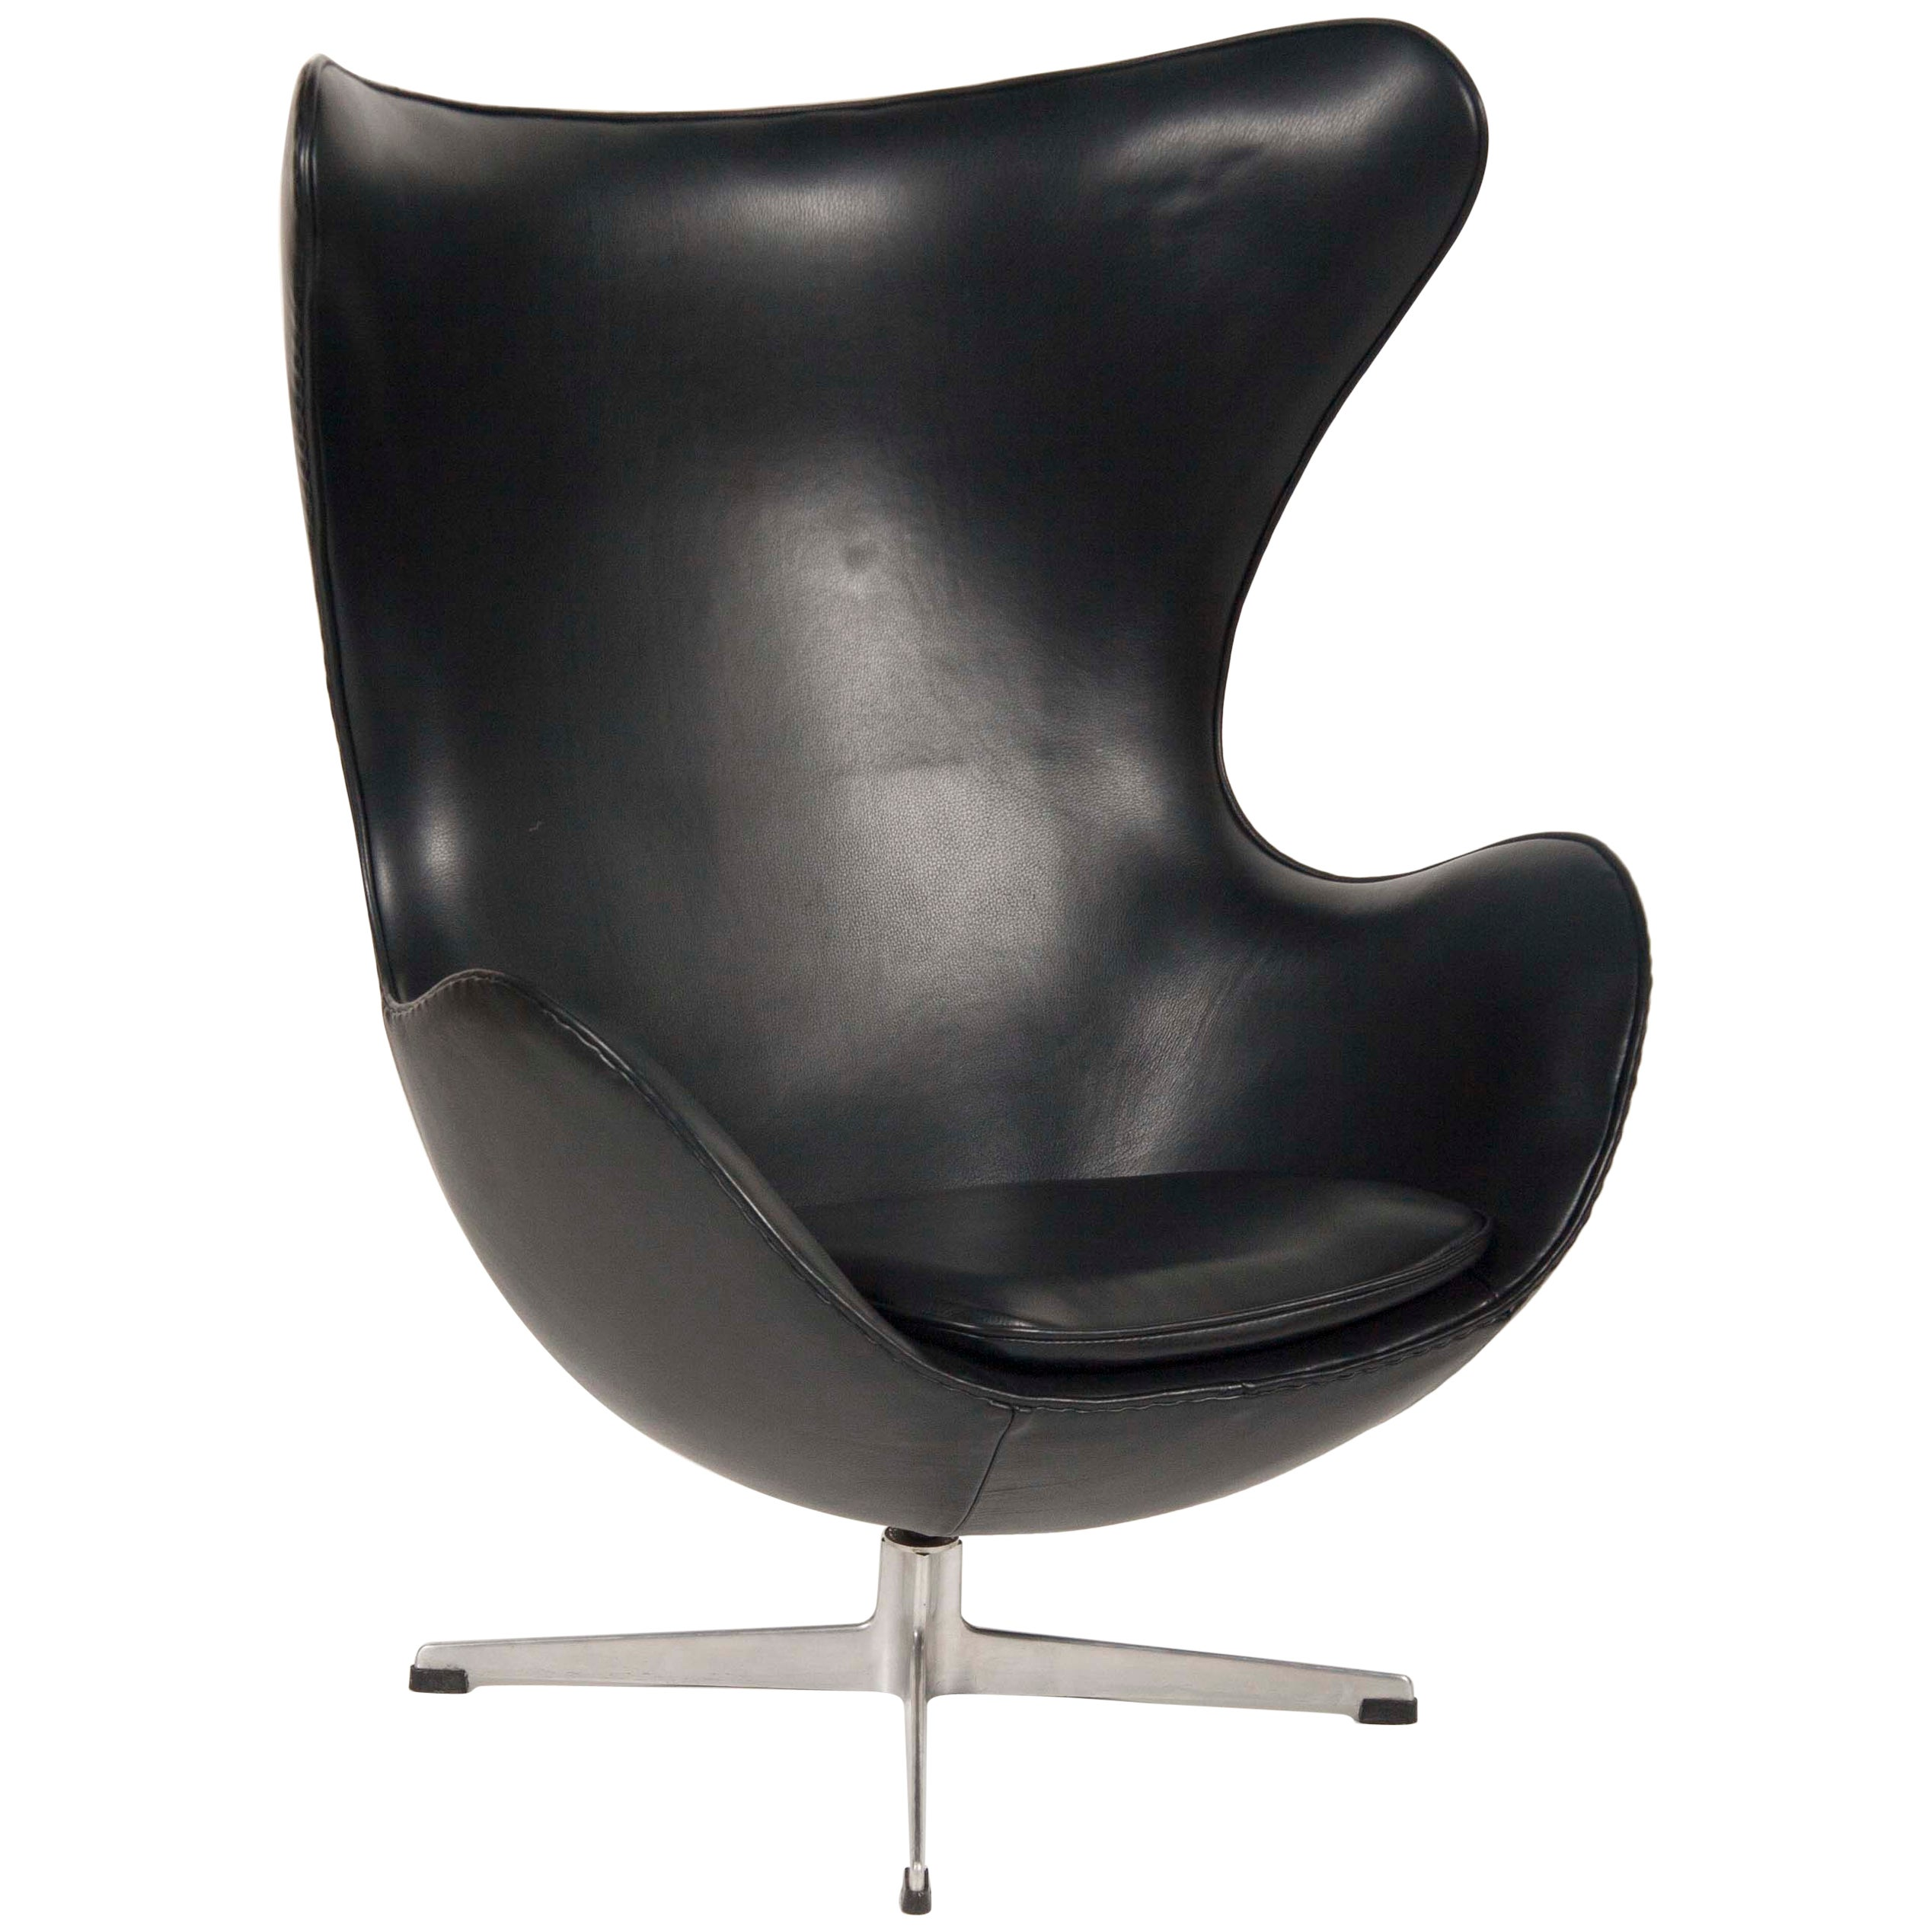 Arne Jacobsen Egg Chair In Edelman Leather